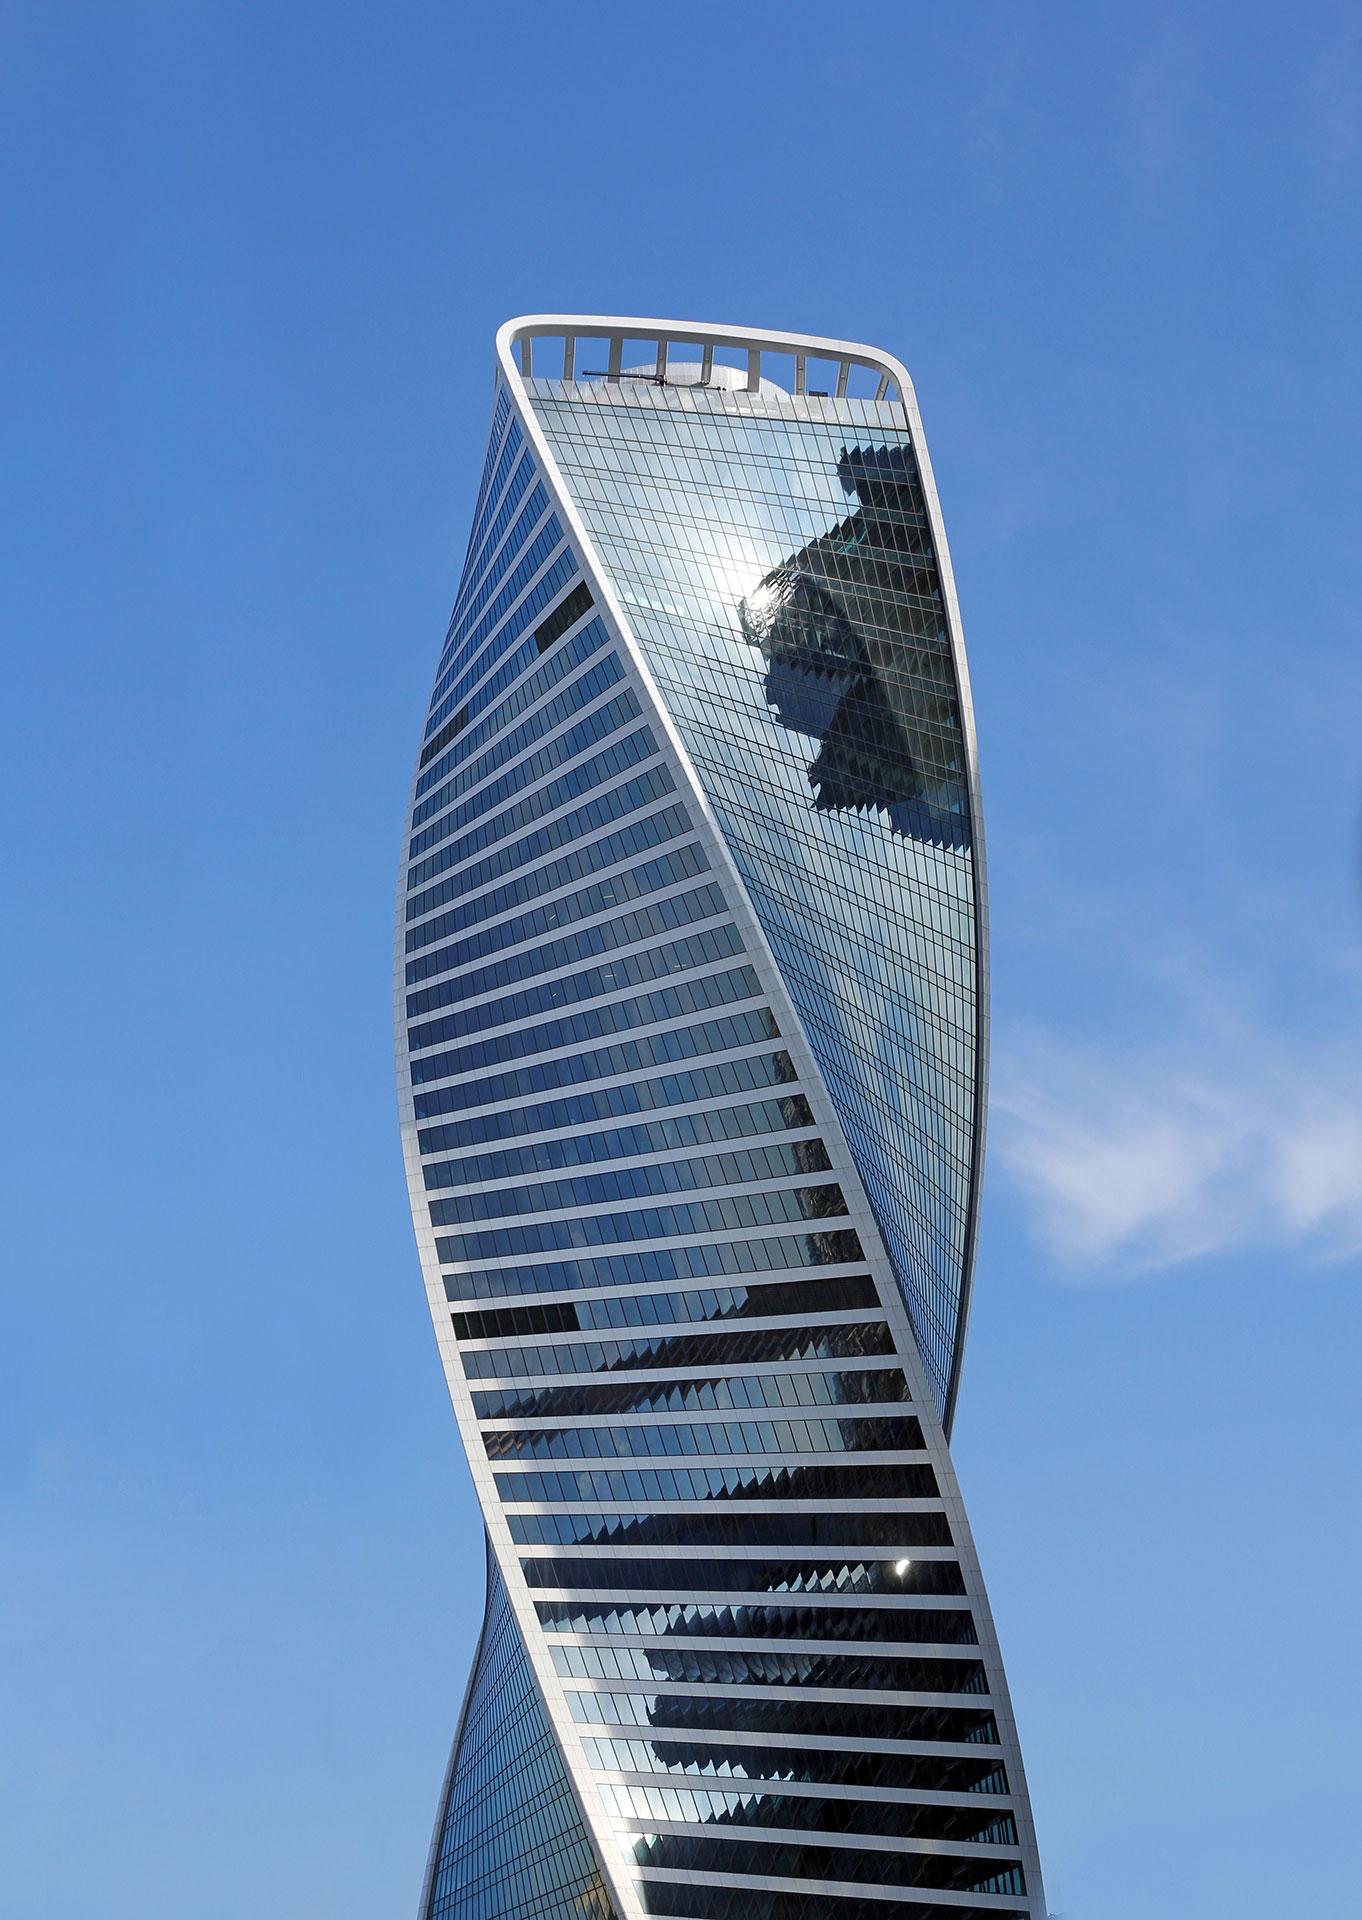 modern-buildings-of-glass-and-steel-skyscrapers-ag-XJT4NLE.jpg